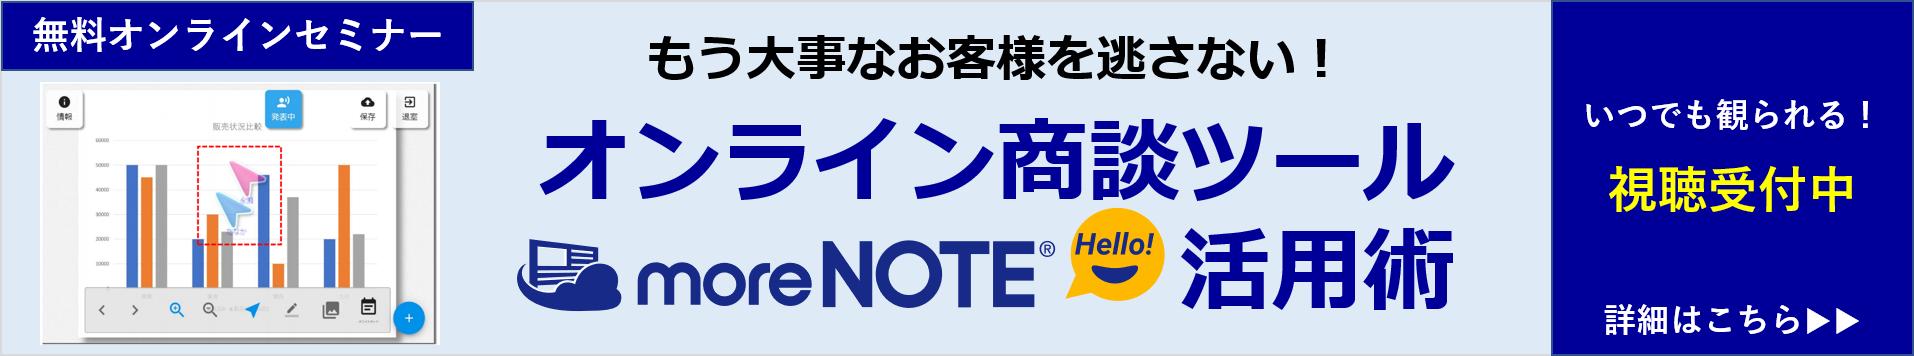 moreNOTE Hello! バナー